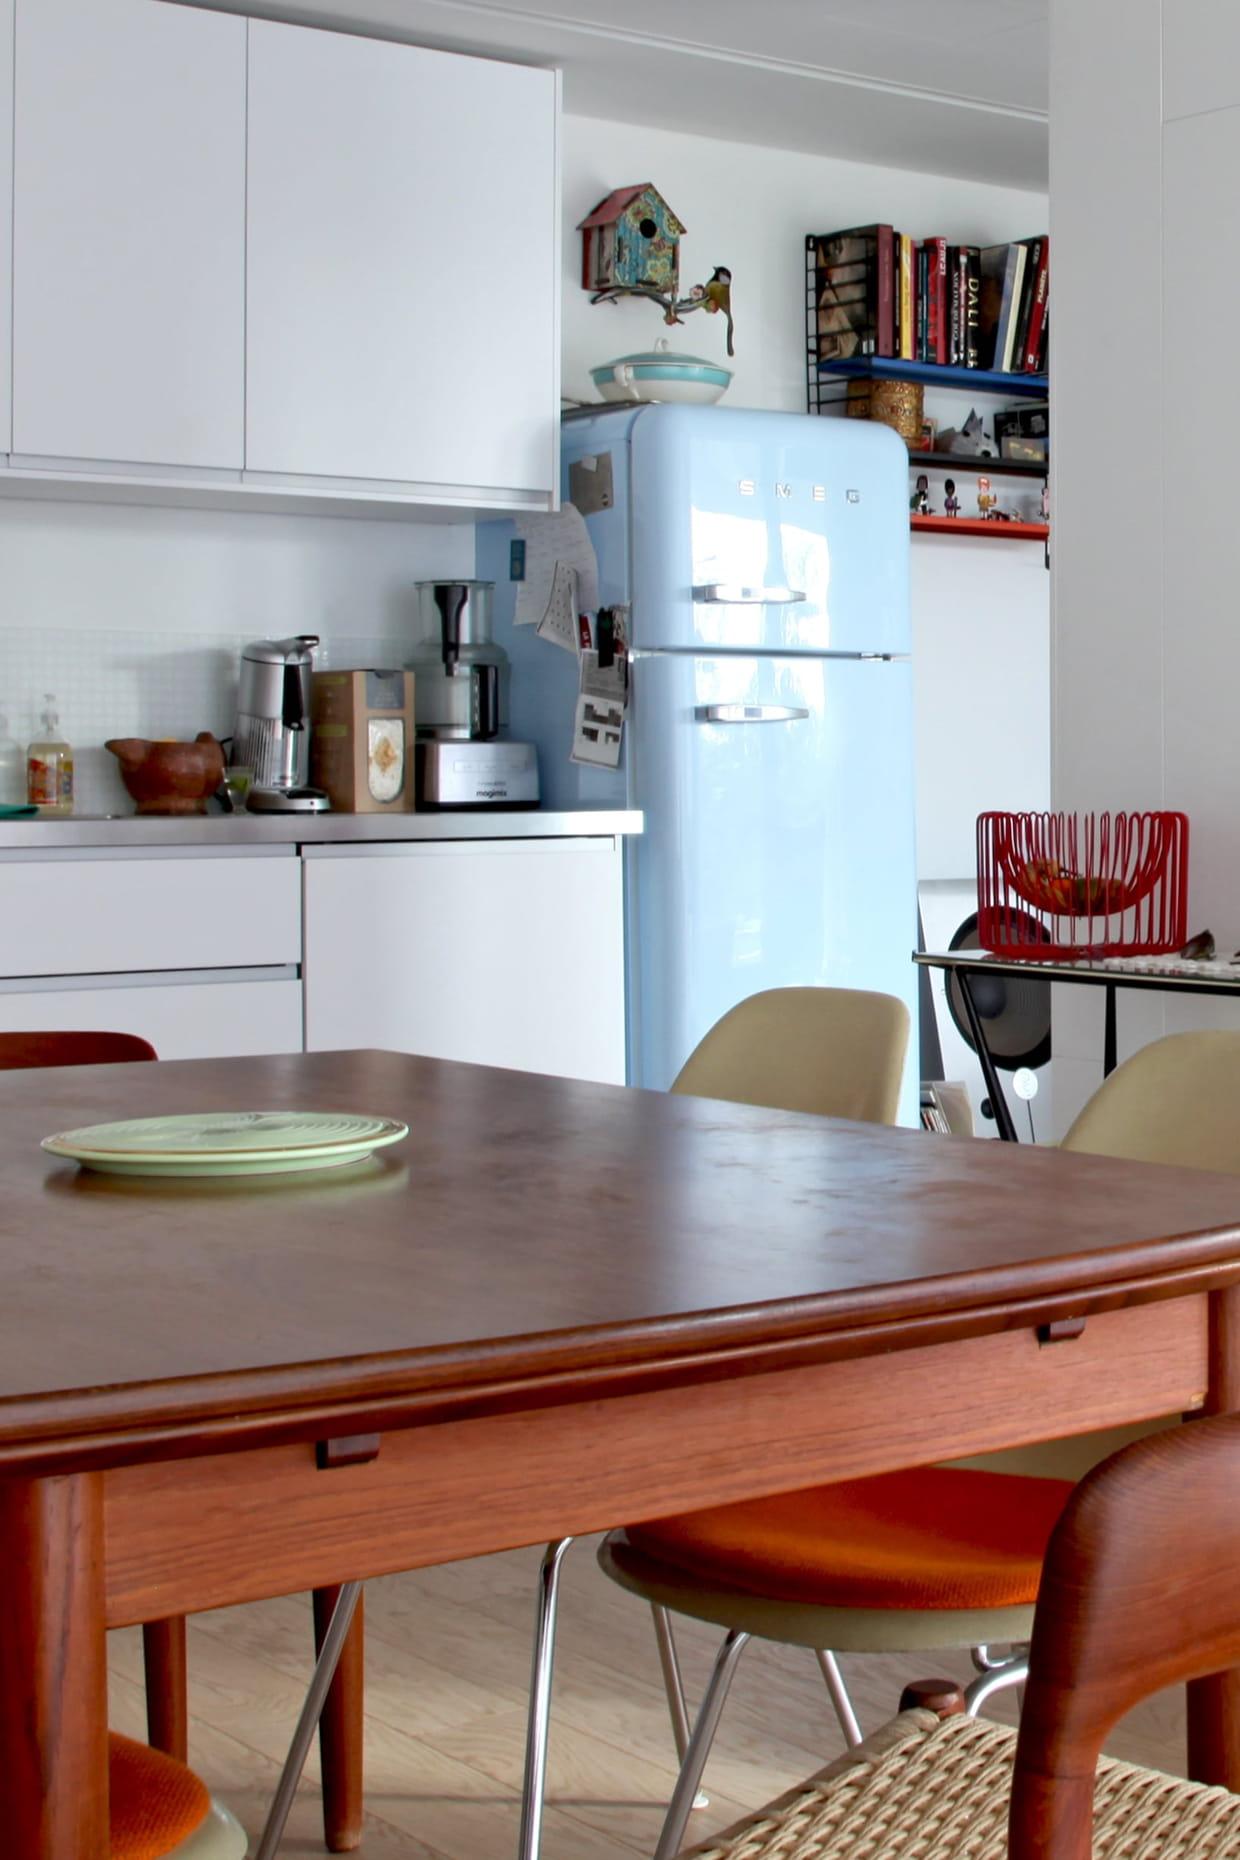 cuisine avec r frig rateur r tro pastel. Black Bedroom Furniture Sets. Home Design Ideas